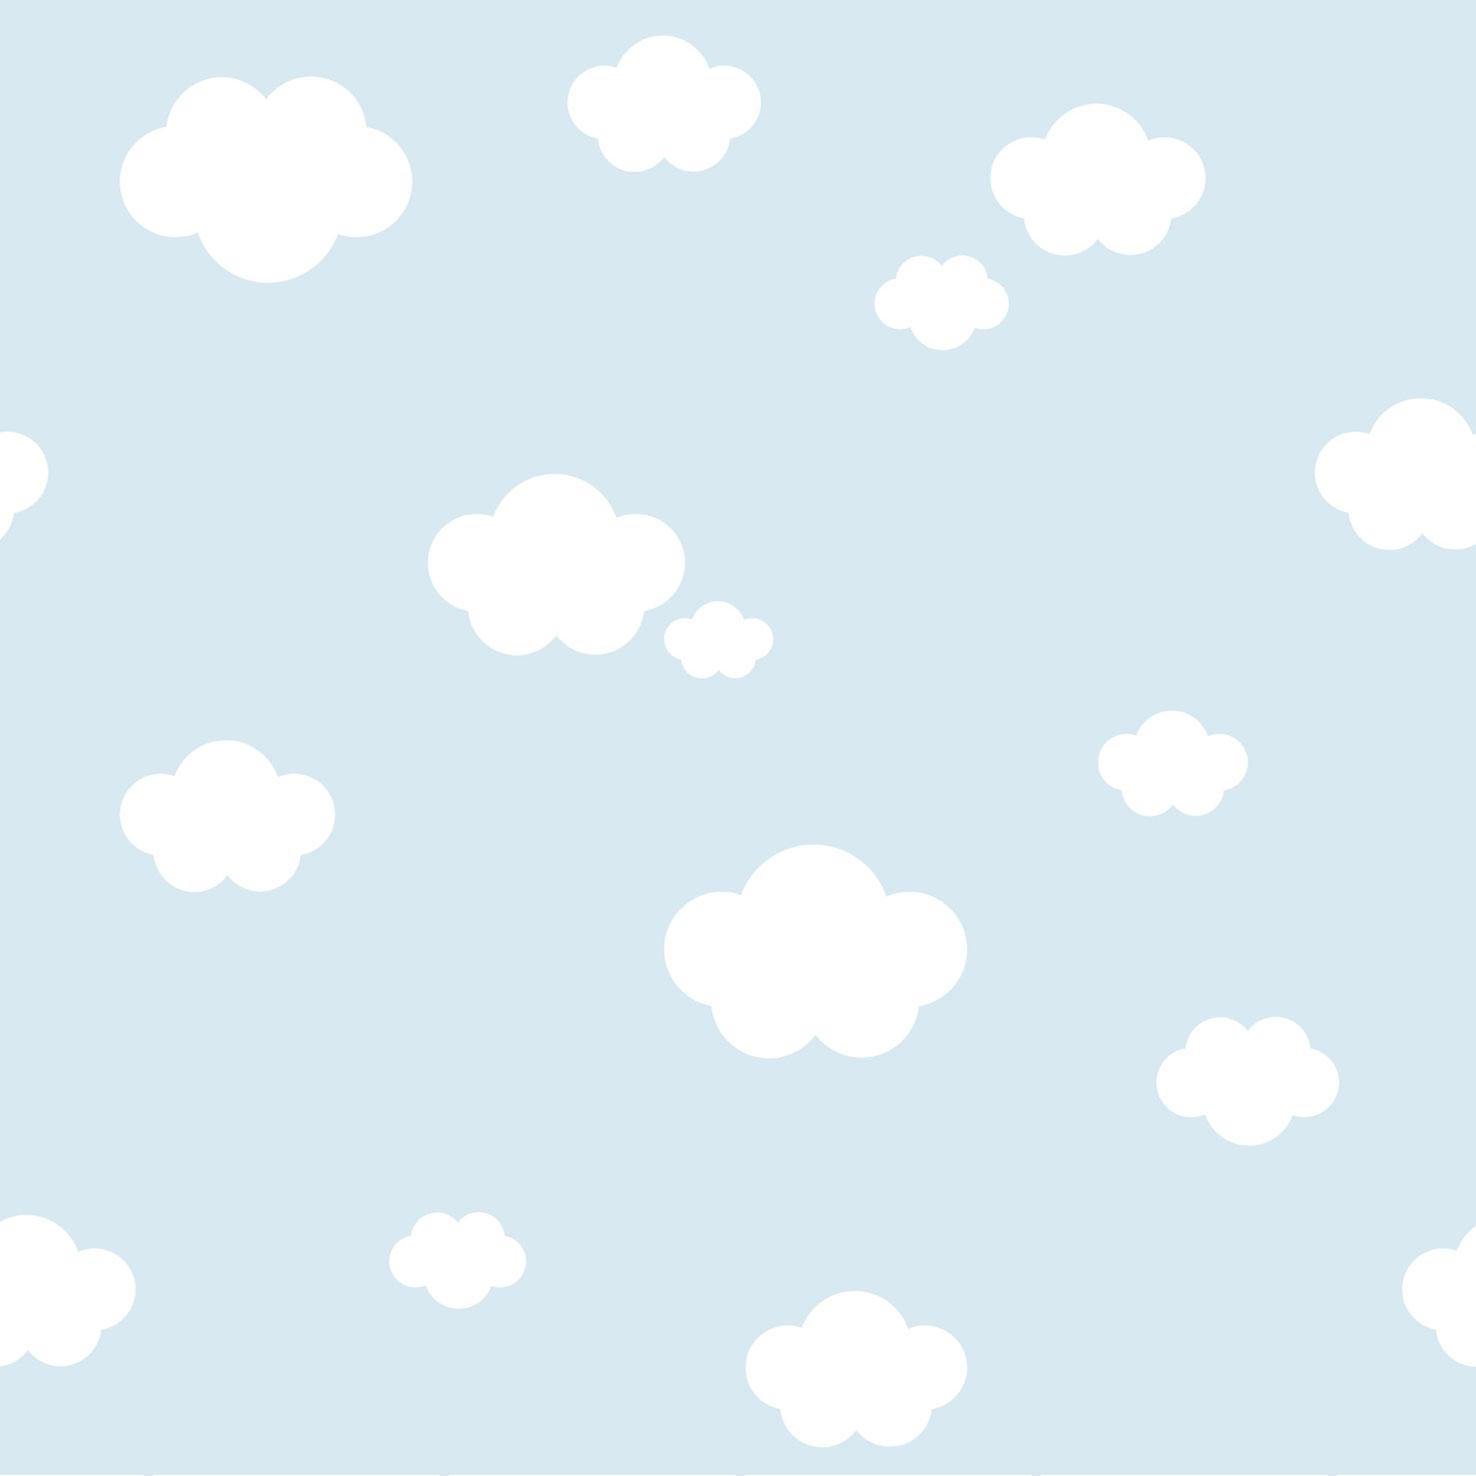 Kindertapete Wolken Himmel Rasch Textil blau 330235